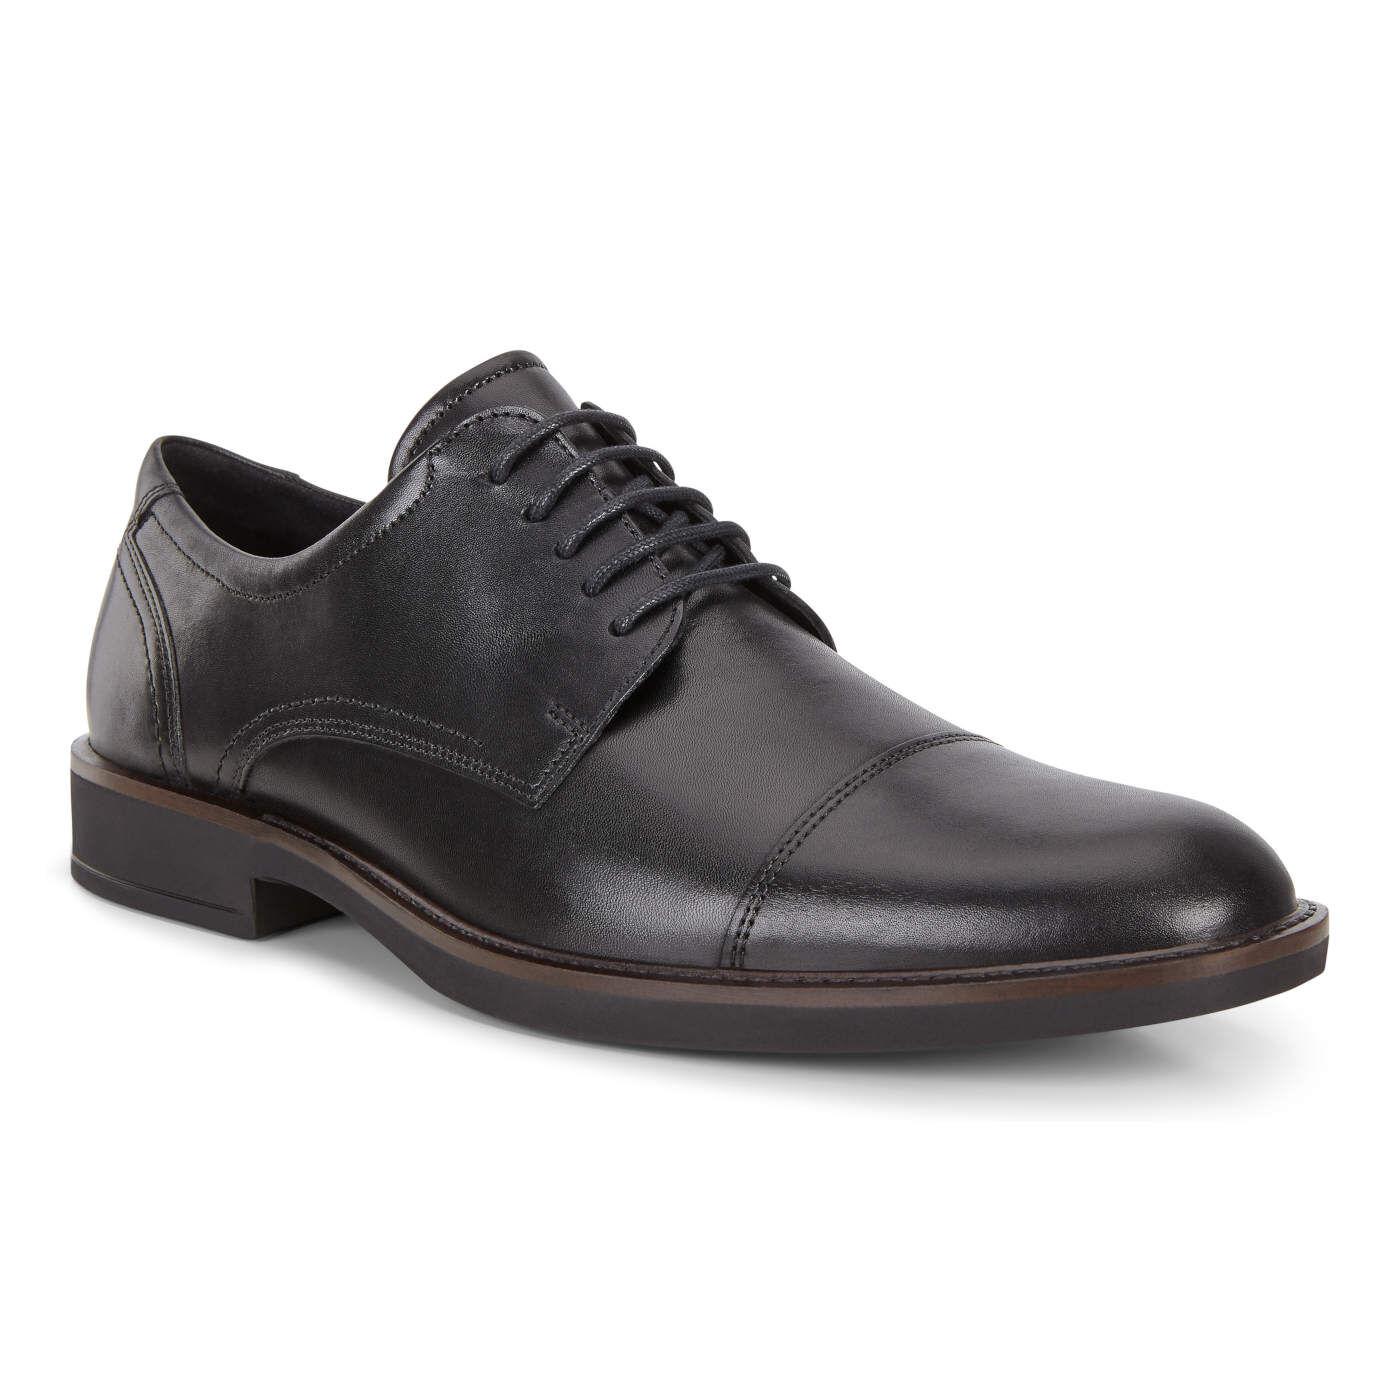 ECCO Biarritz Mens Dress Shoe